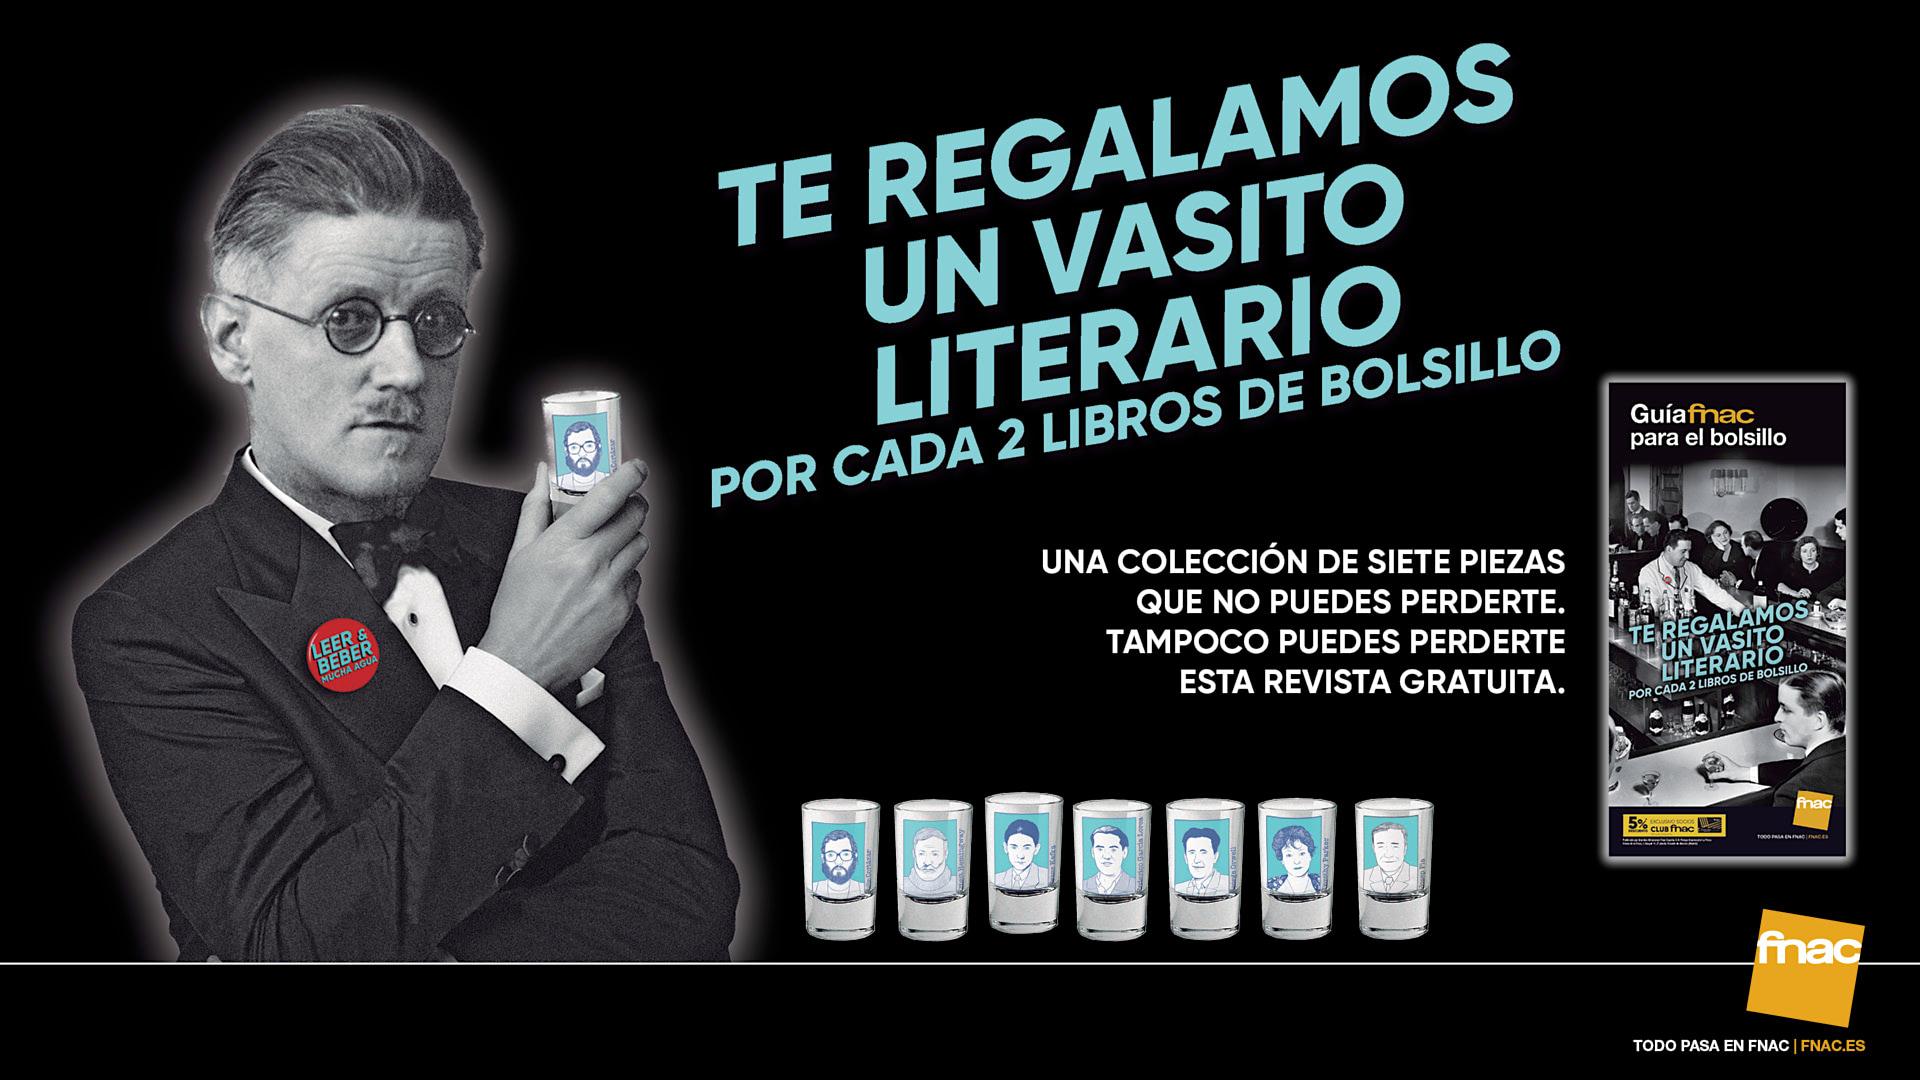 Vasitos literarios fnac plaza norte 2 - H m plaza norte ...